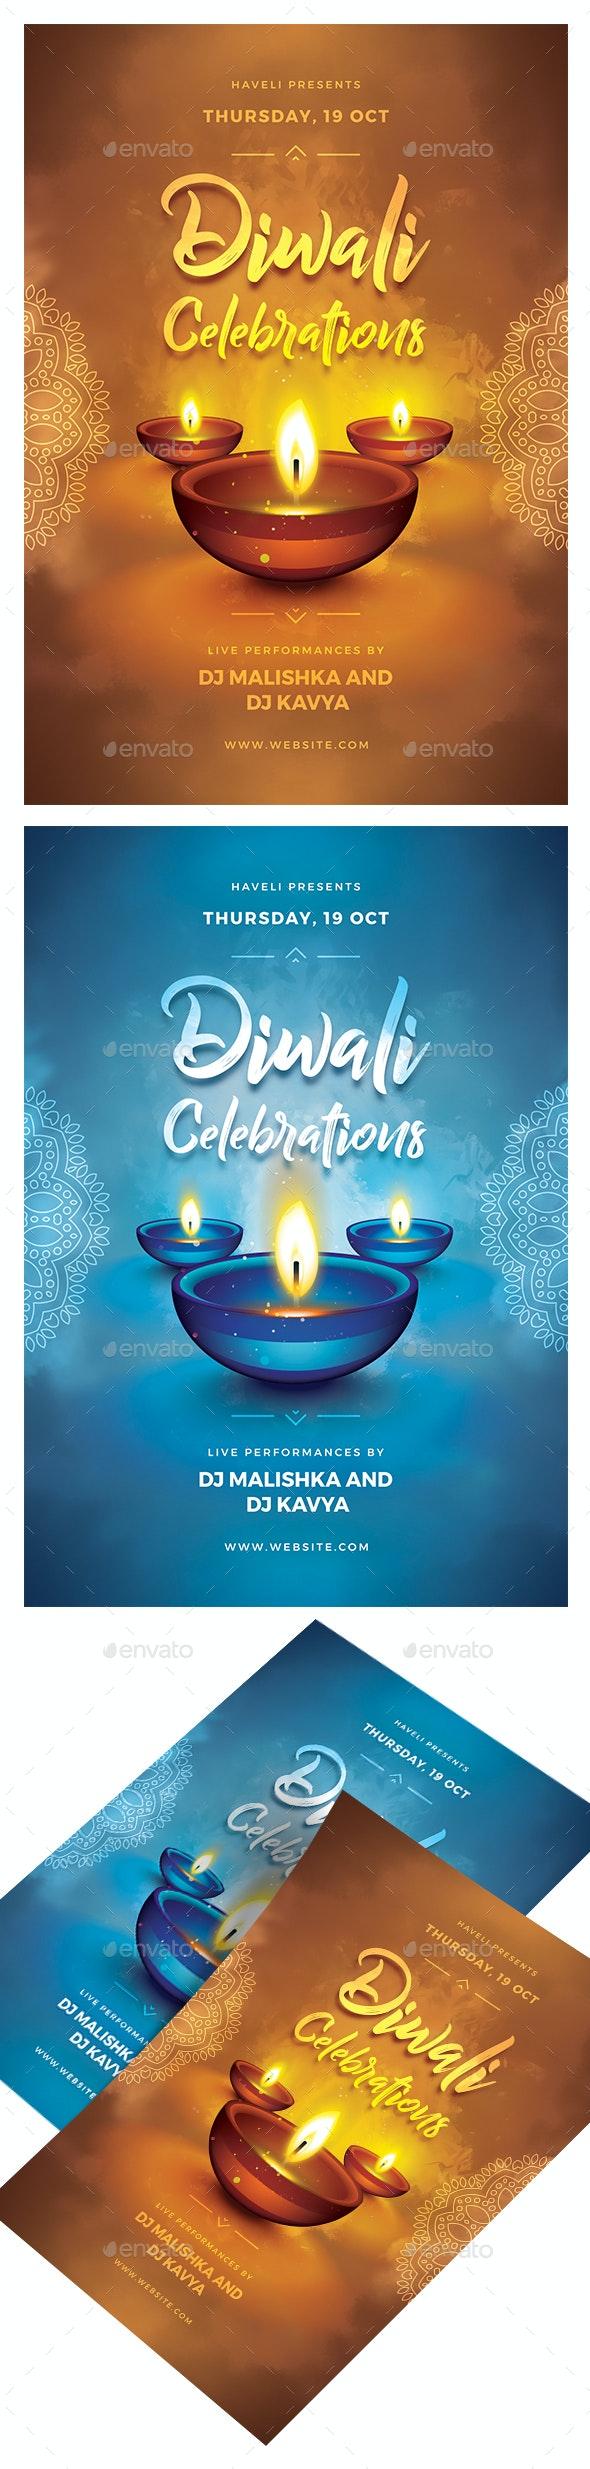 Diwali Celebrations Flyer - Events Flyers